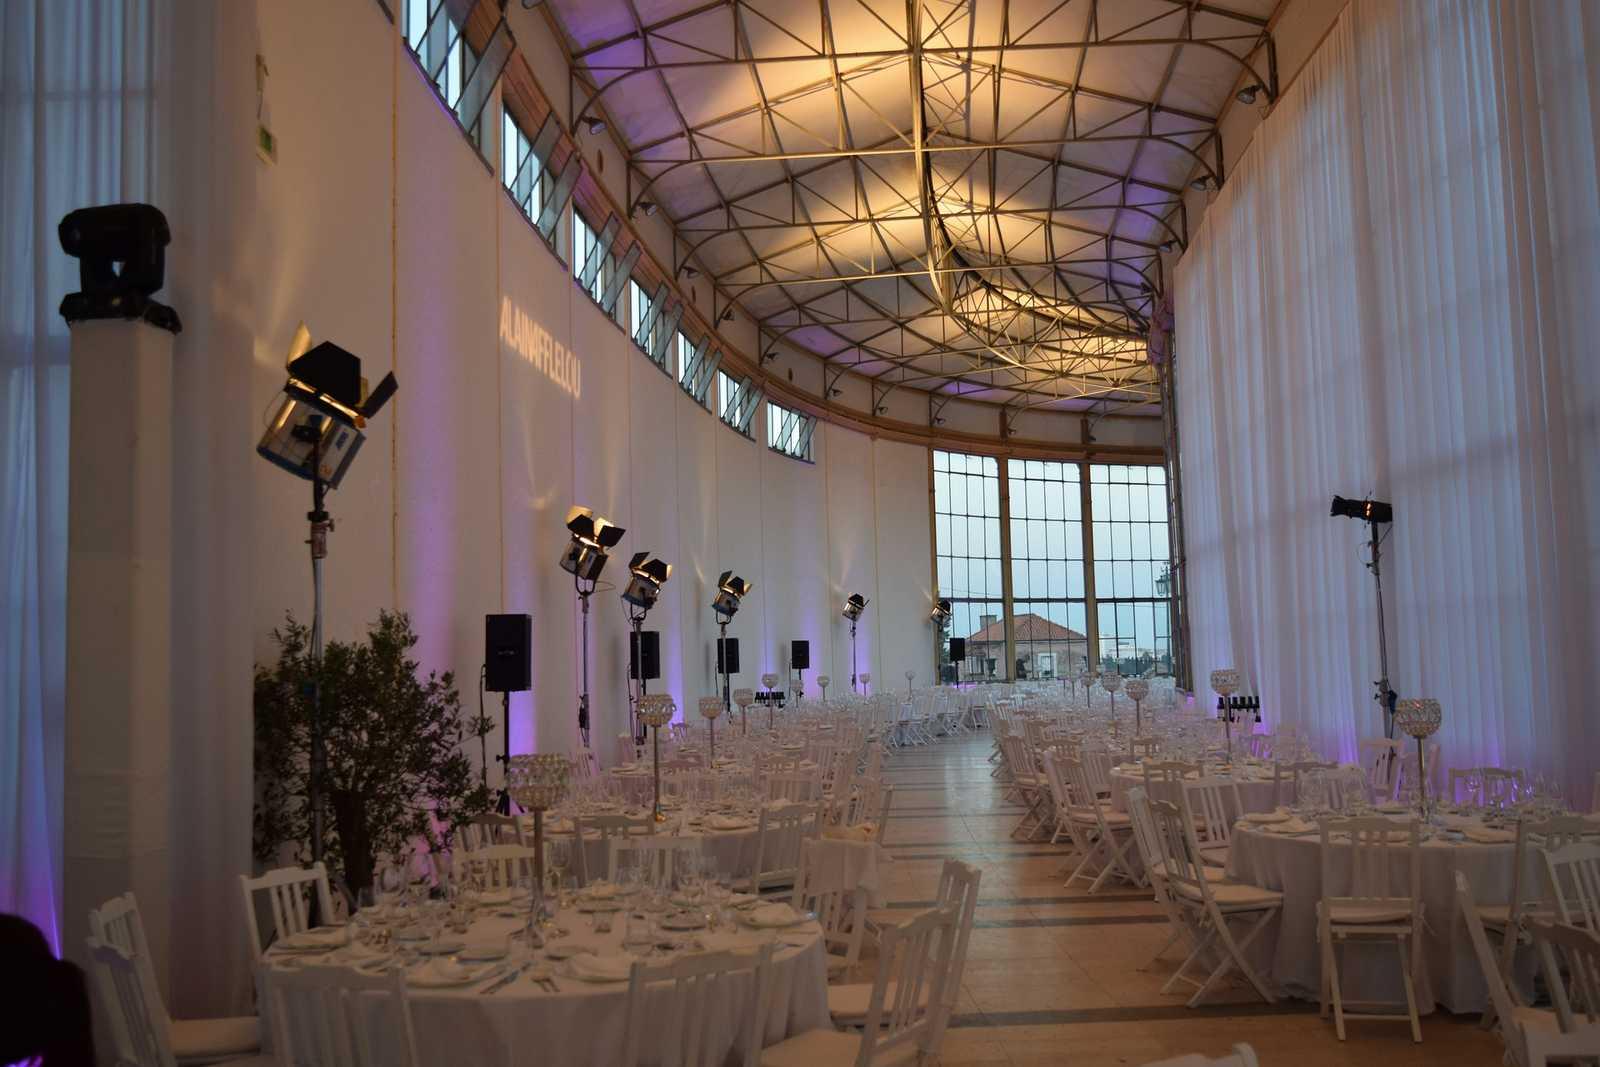 dukemoita-events-986055-1600x